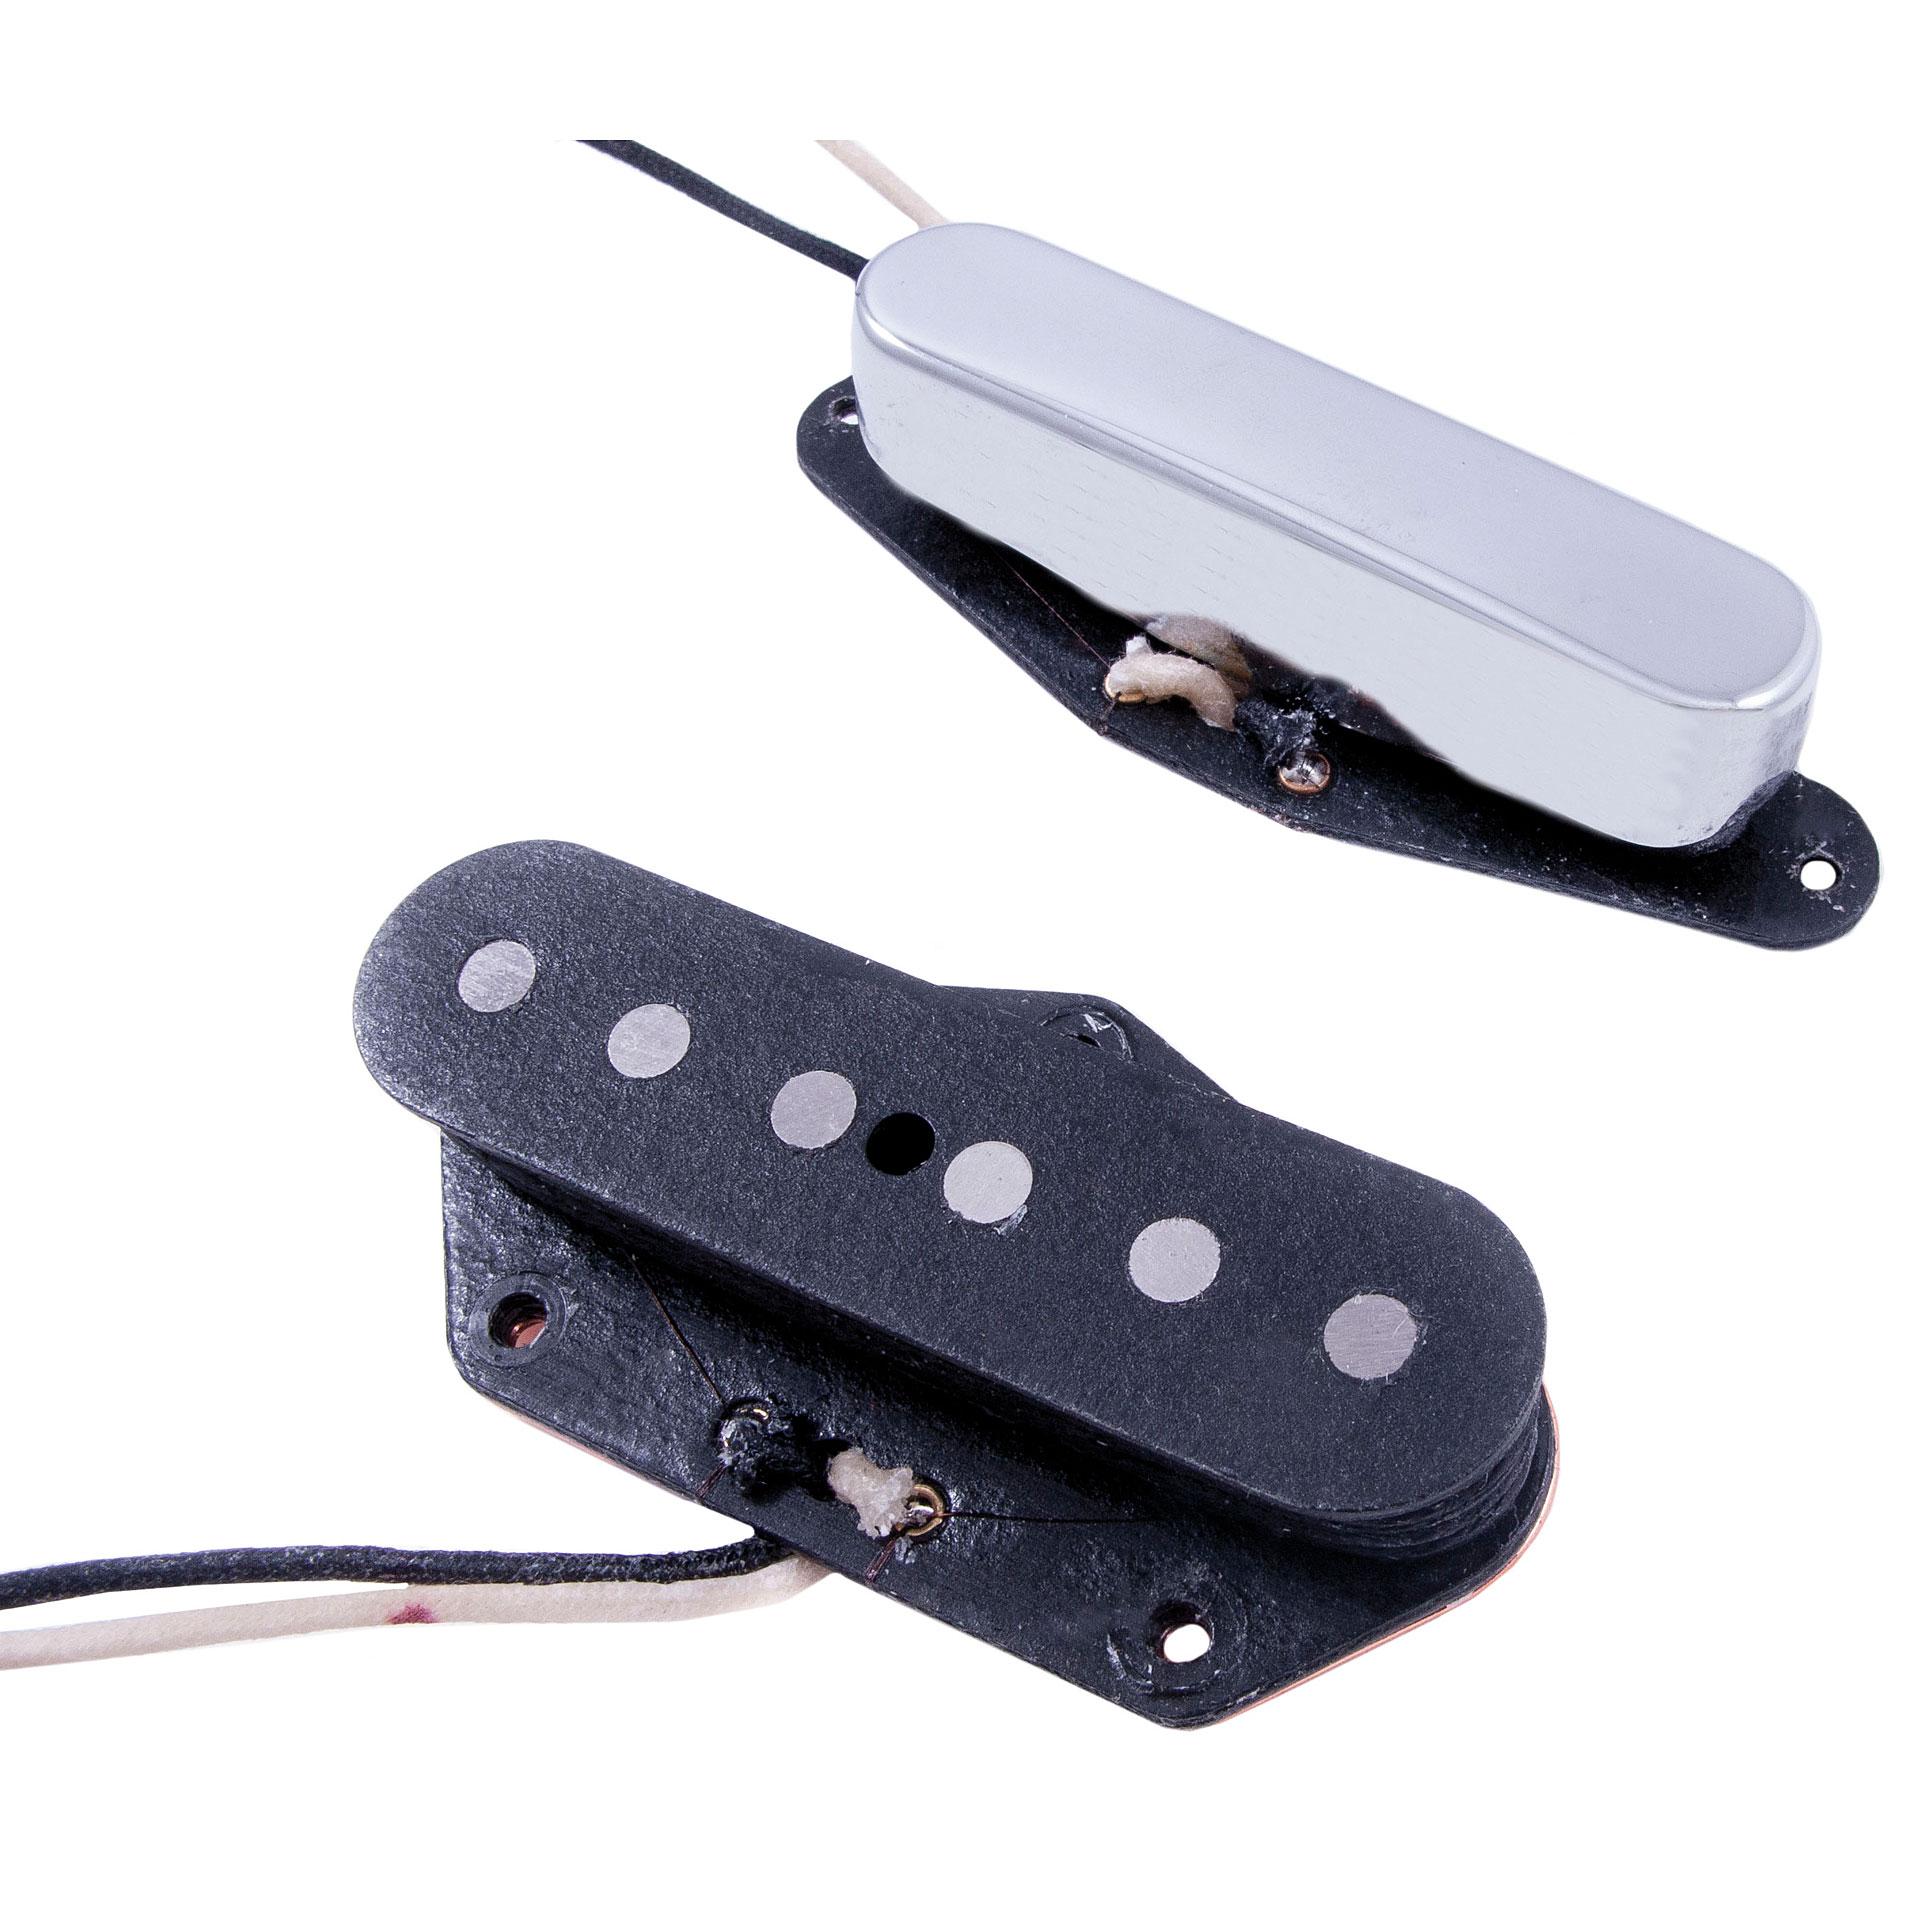 fender blackguard set micro guitare lectrique. Black Bedroom Furniture Sets. Home Design Ideas